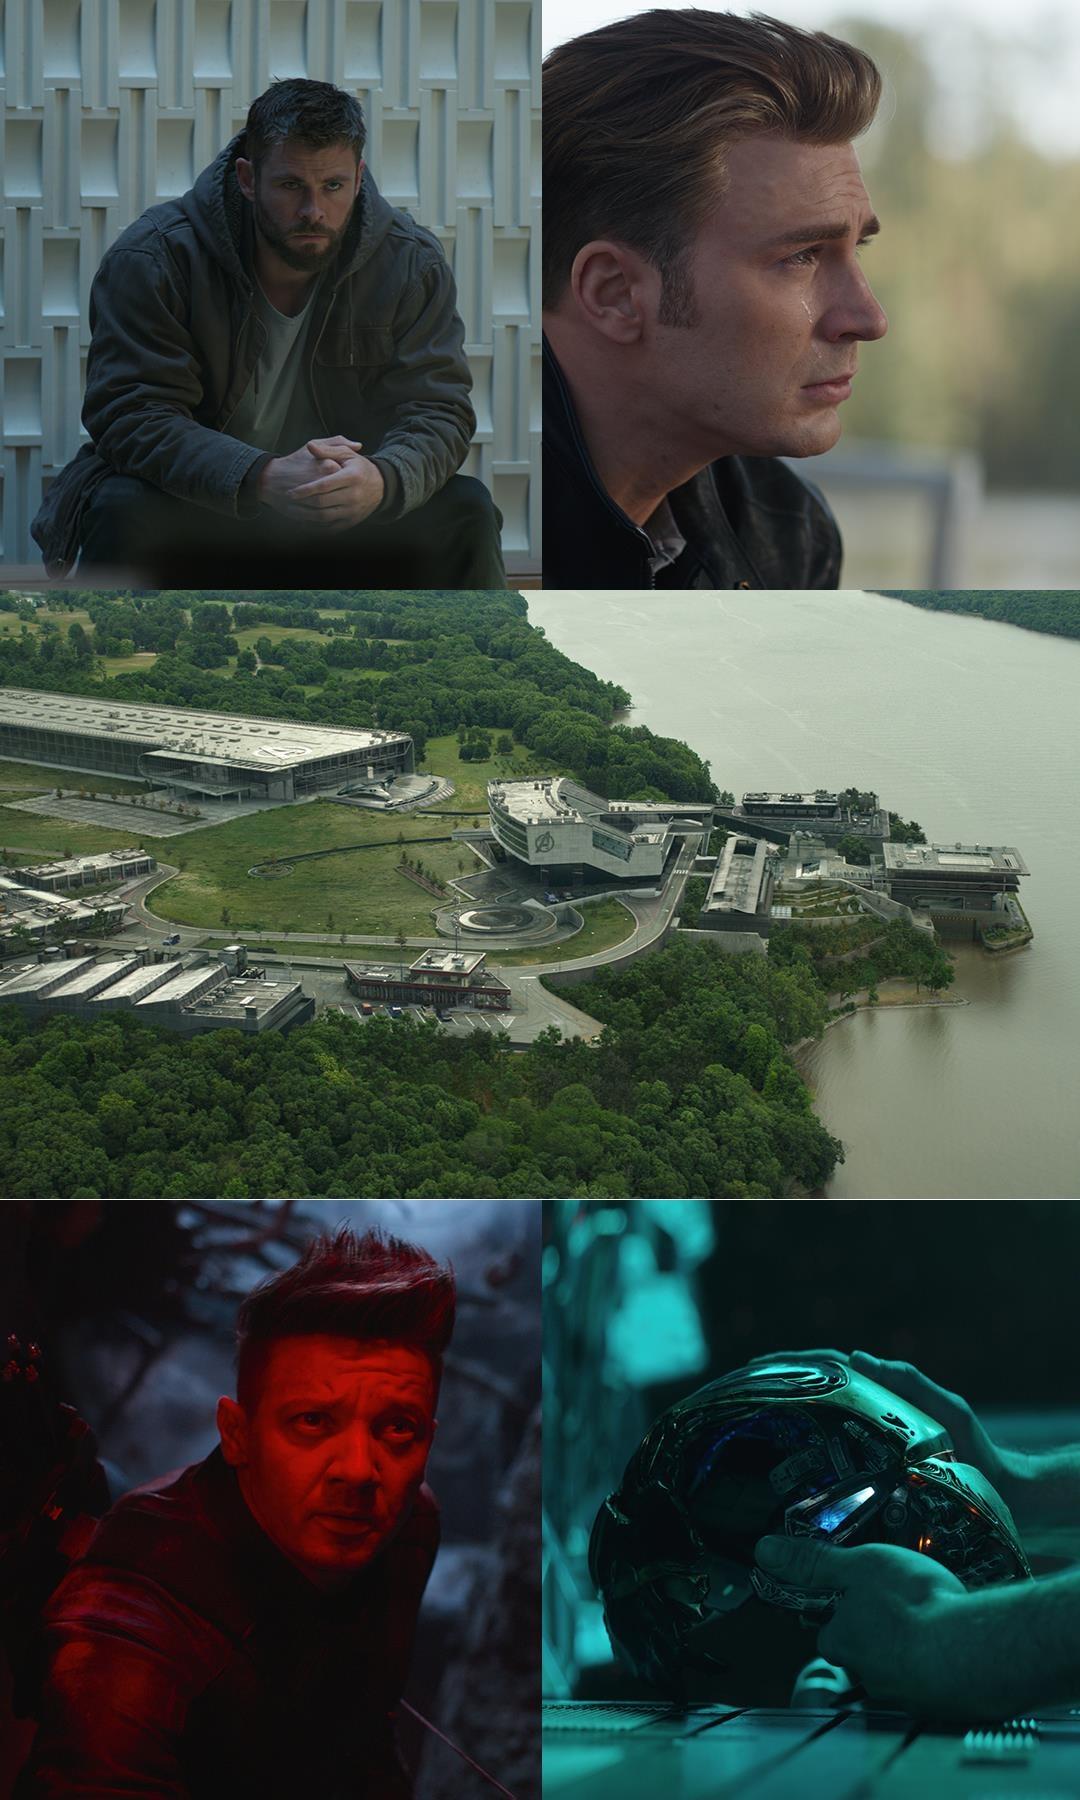 'Avengers: Endgame' - loi tam biet bi trang cua mot ky nguyen anh hung hinh anh 14